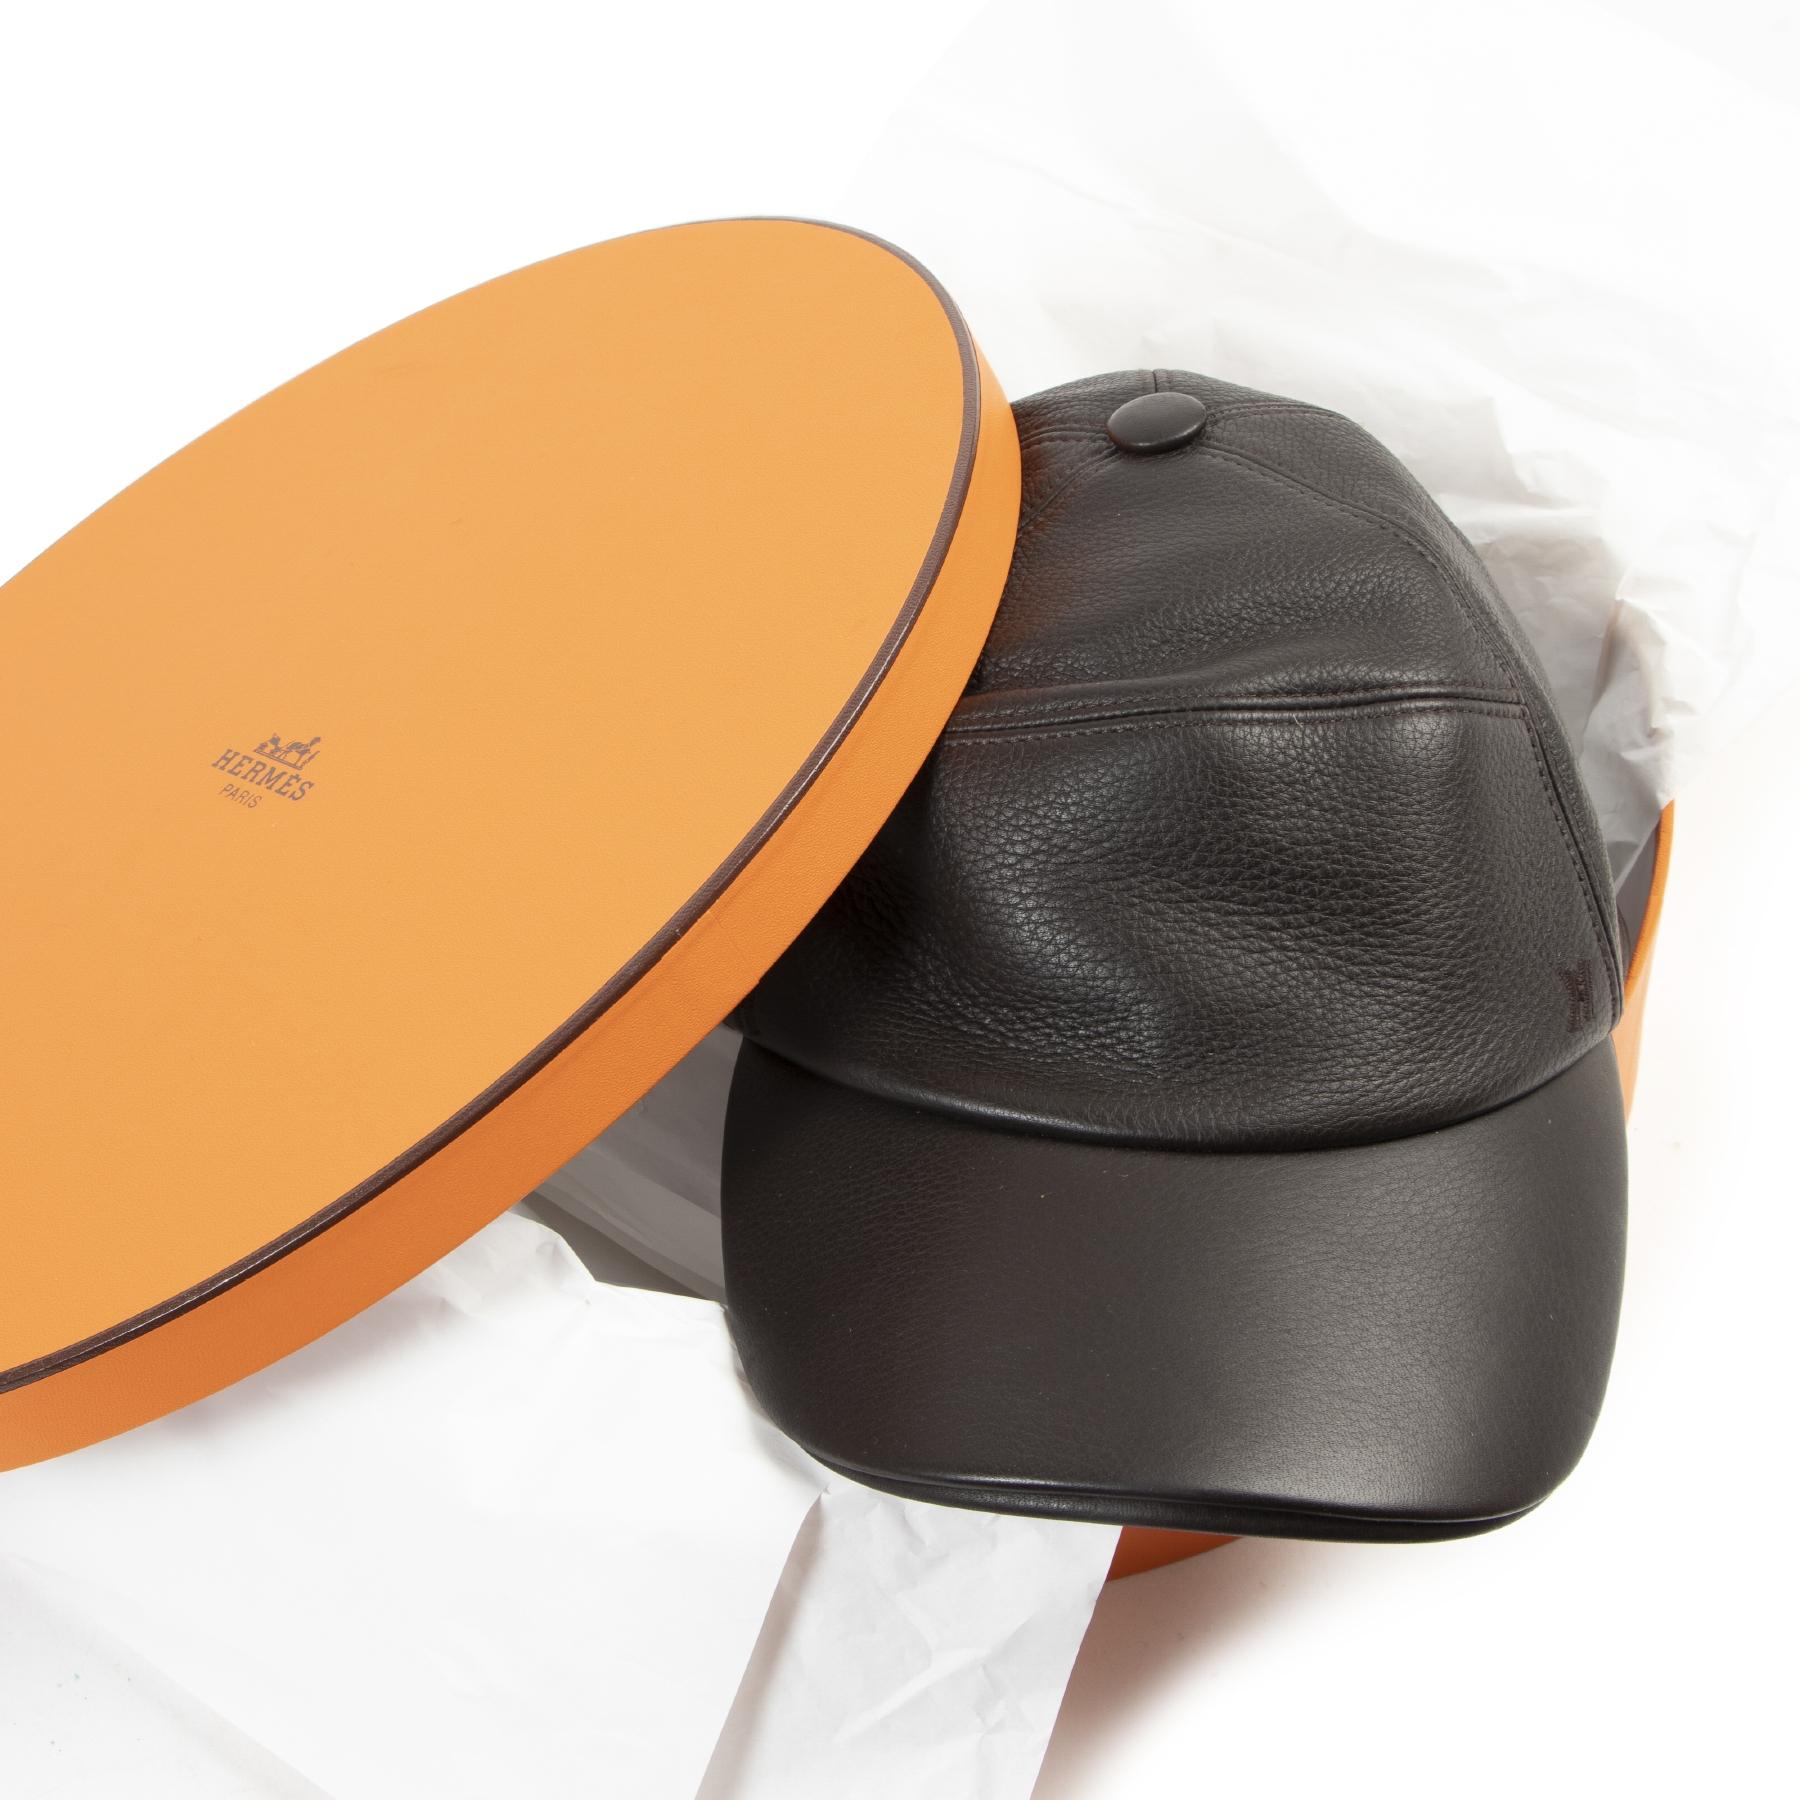 acheter en ligne seconde main Hermès Dark Brown Leather Cap - size 59